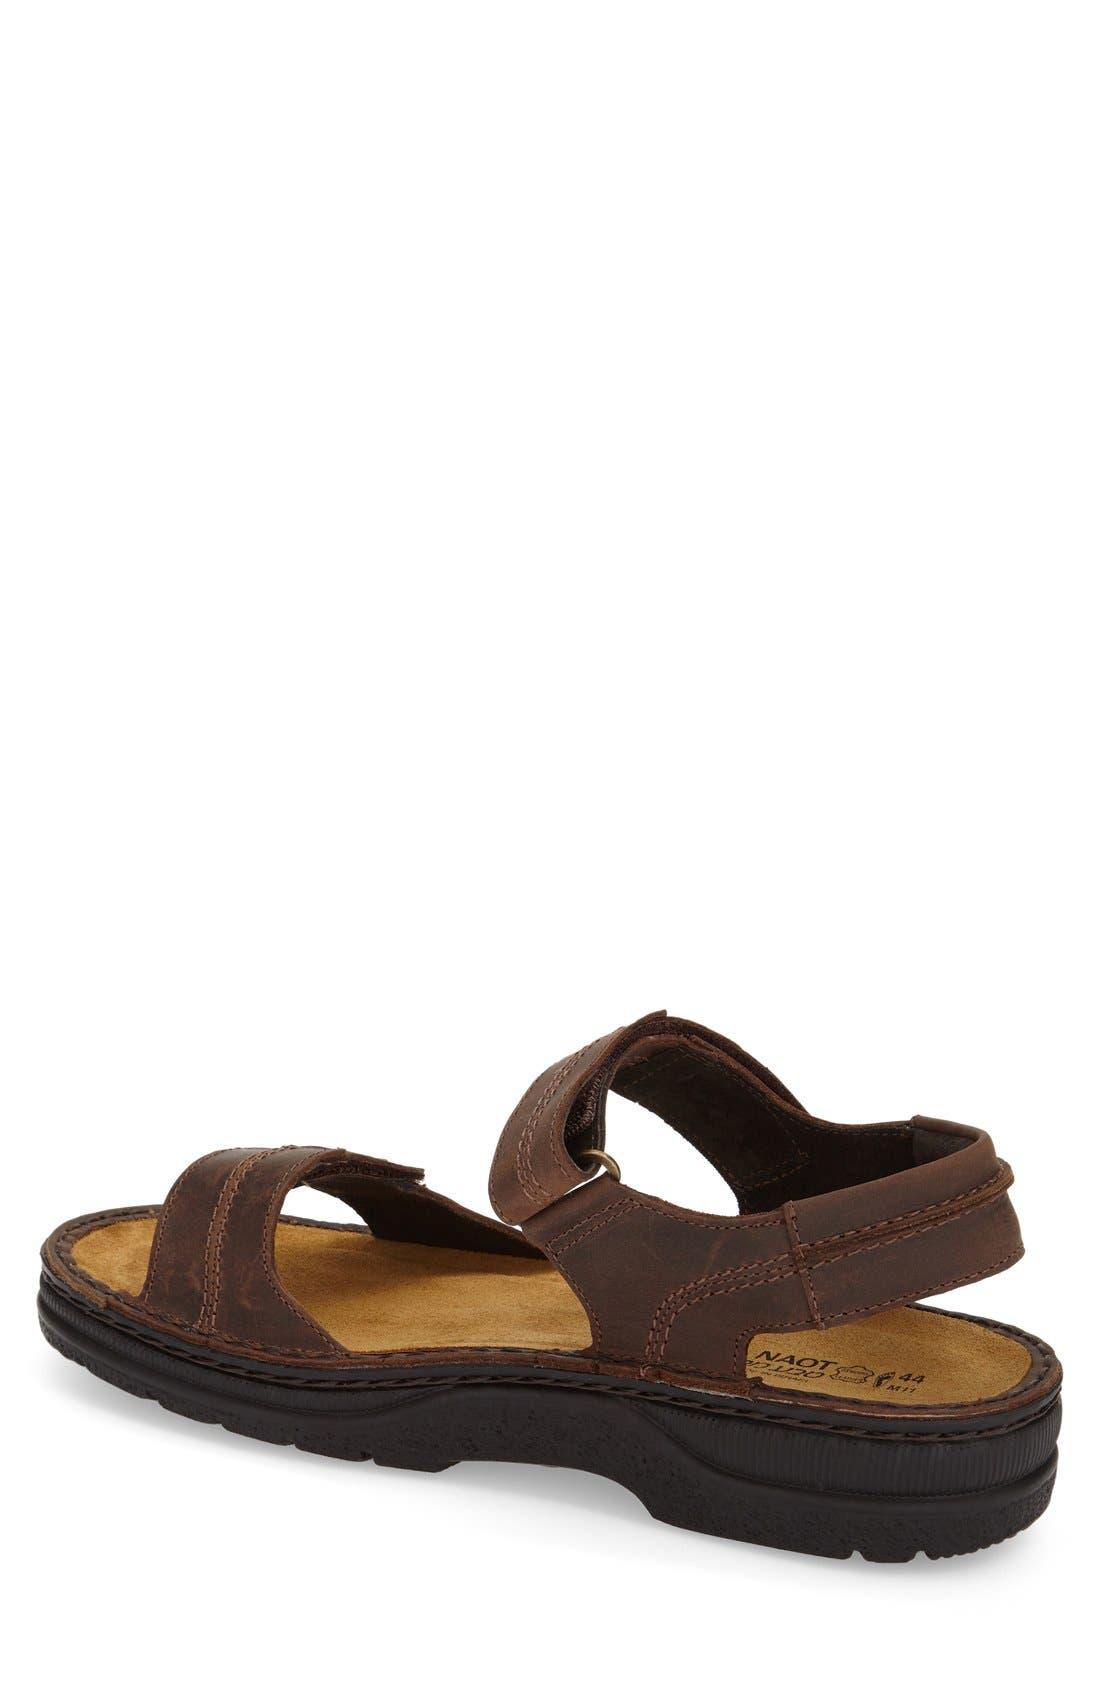 Balkan Sandal,                             Alternate thumbnail 2, color,                             Brown Leather